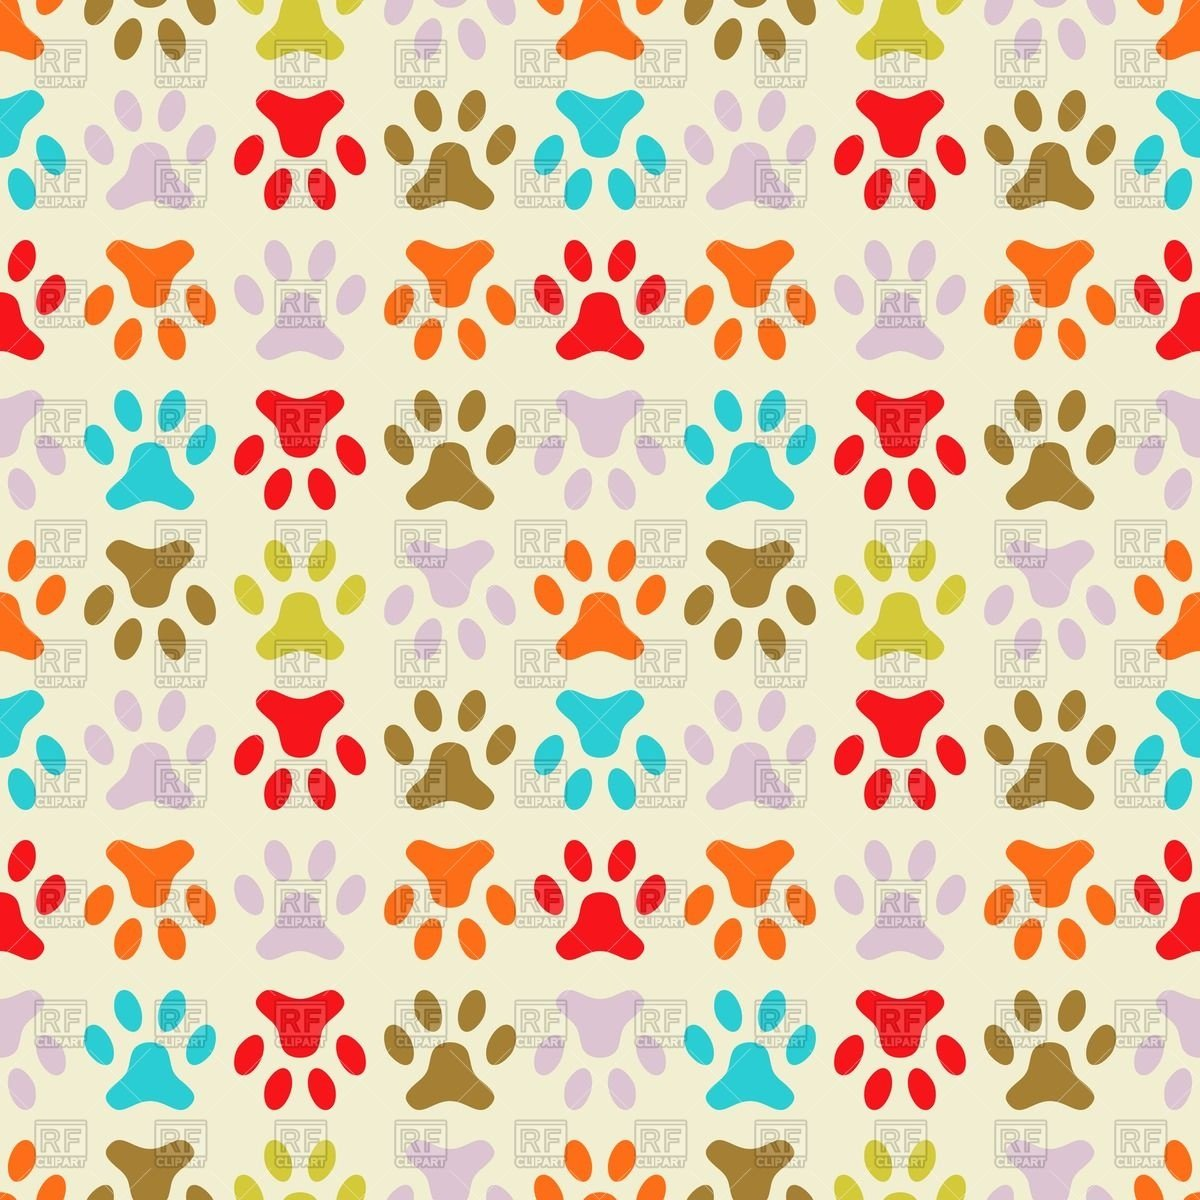 1200x1200px dog print wallpaper wallpapersafari - Dog print wallpaper ...